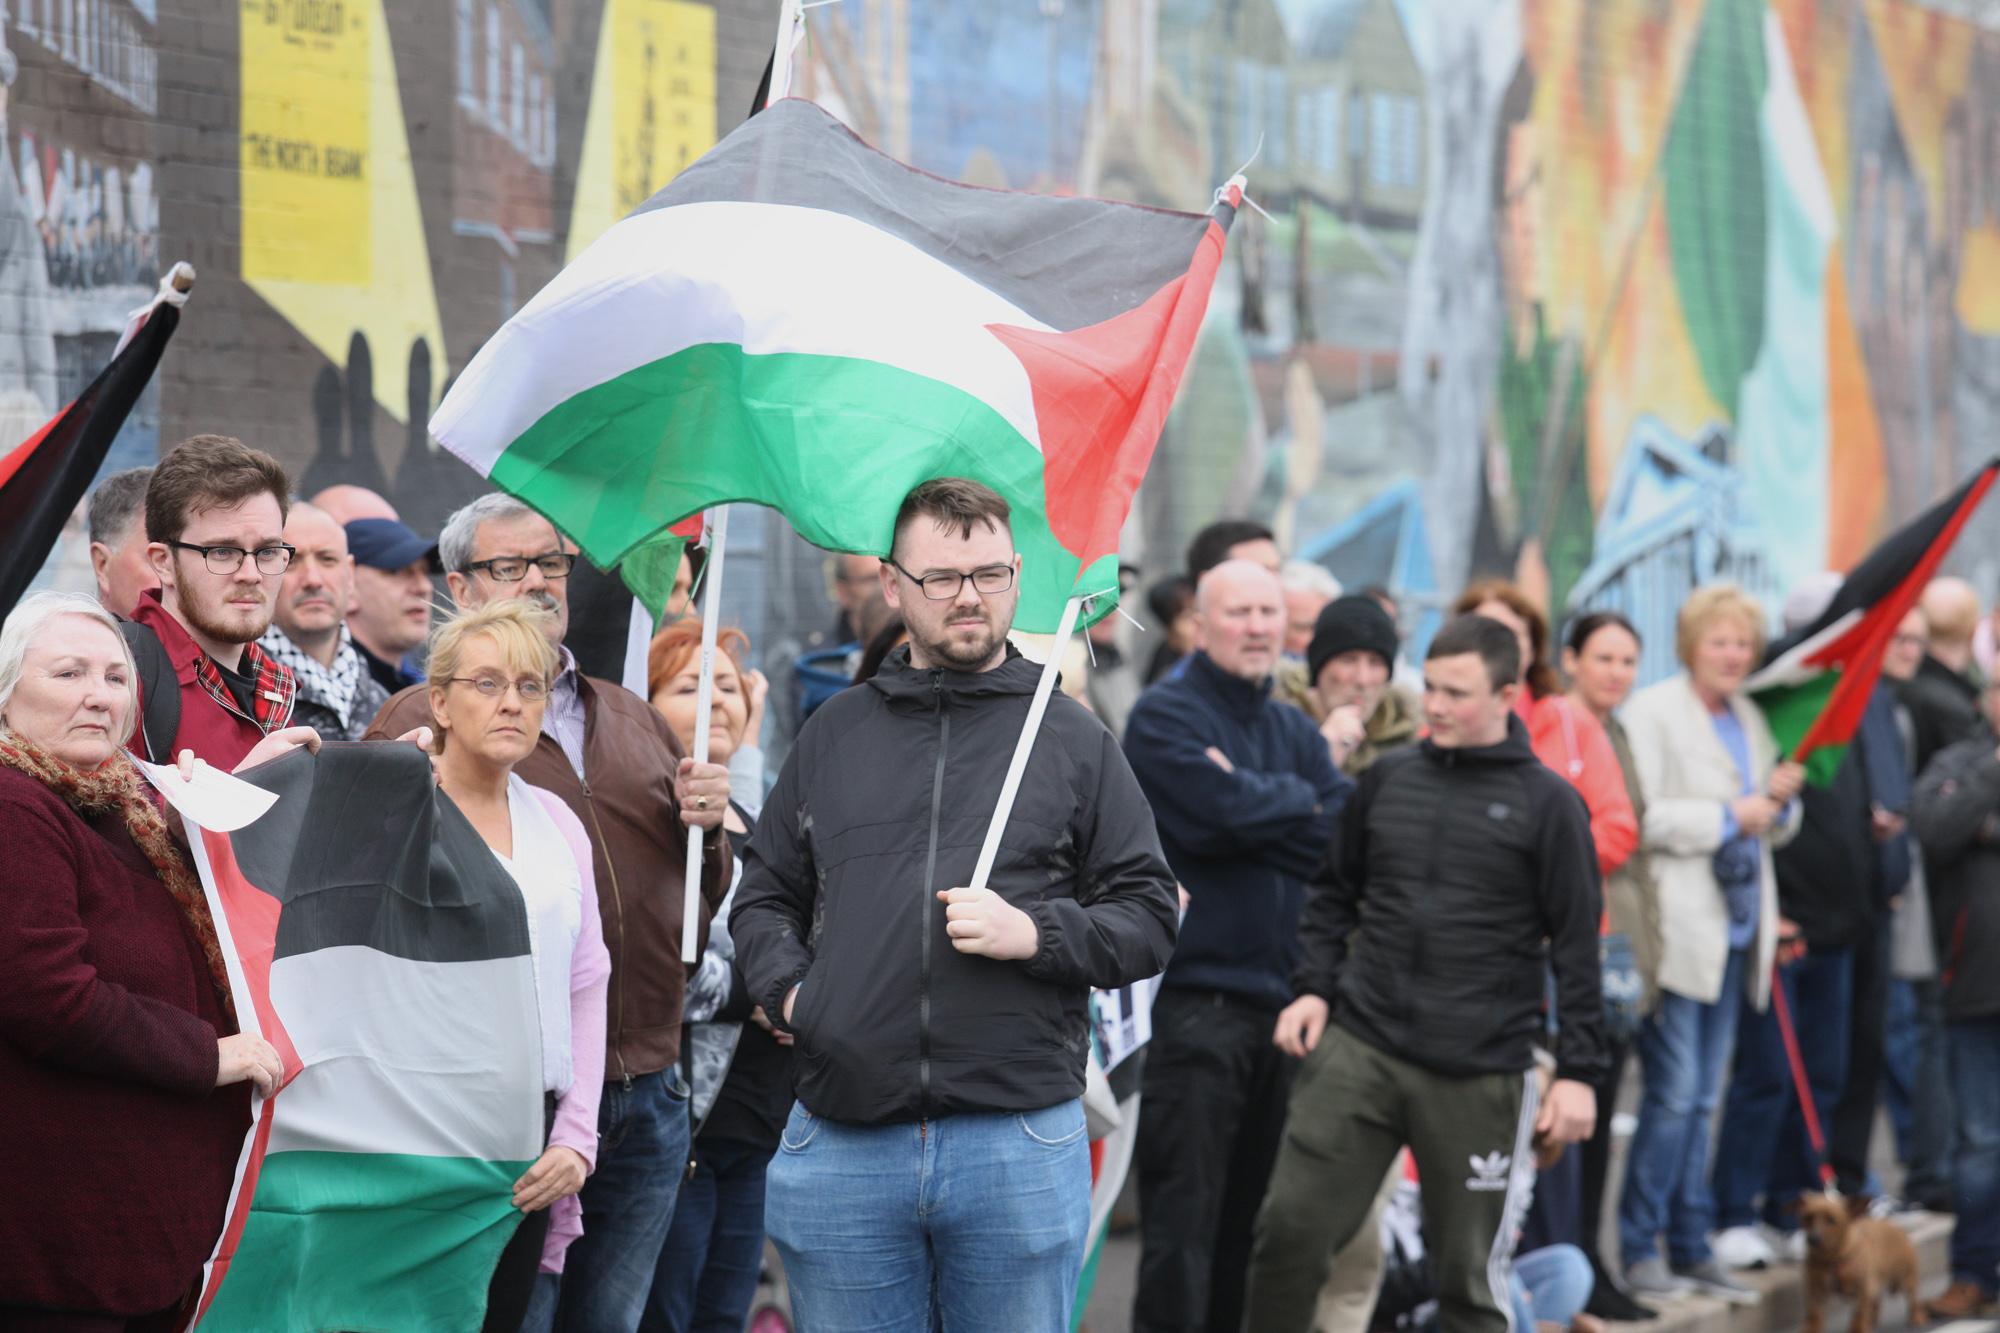 Belfast for gaza 1505tm18 08